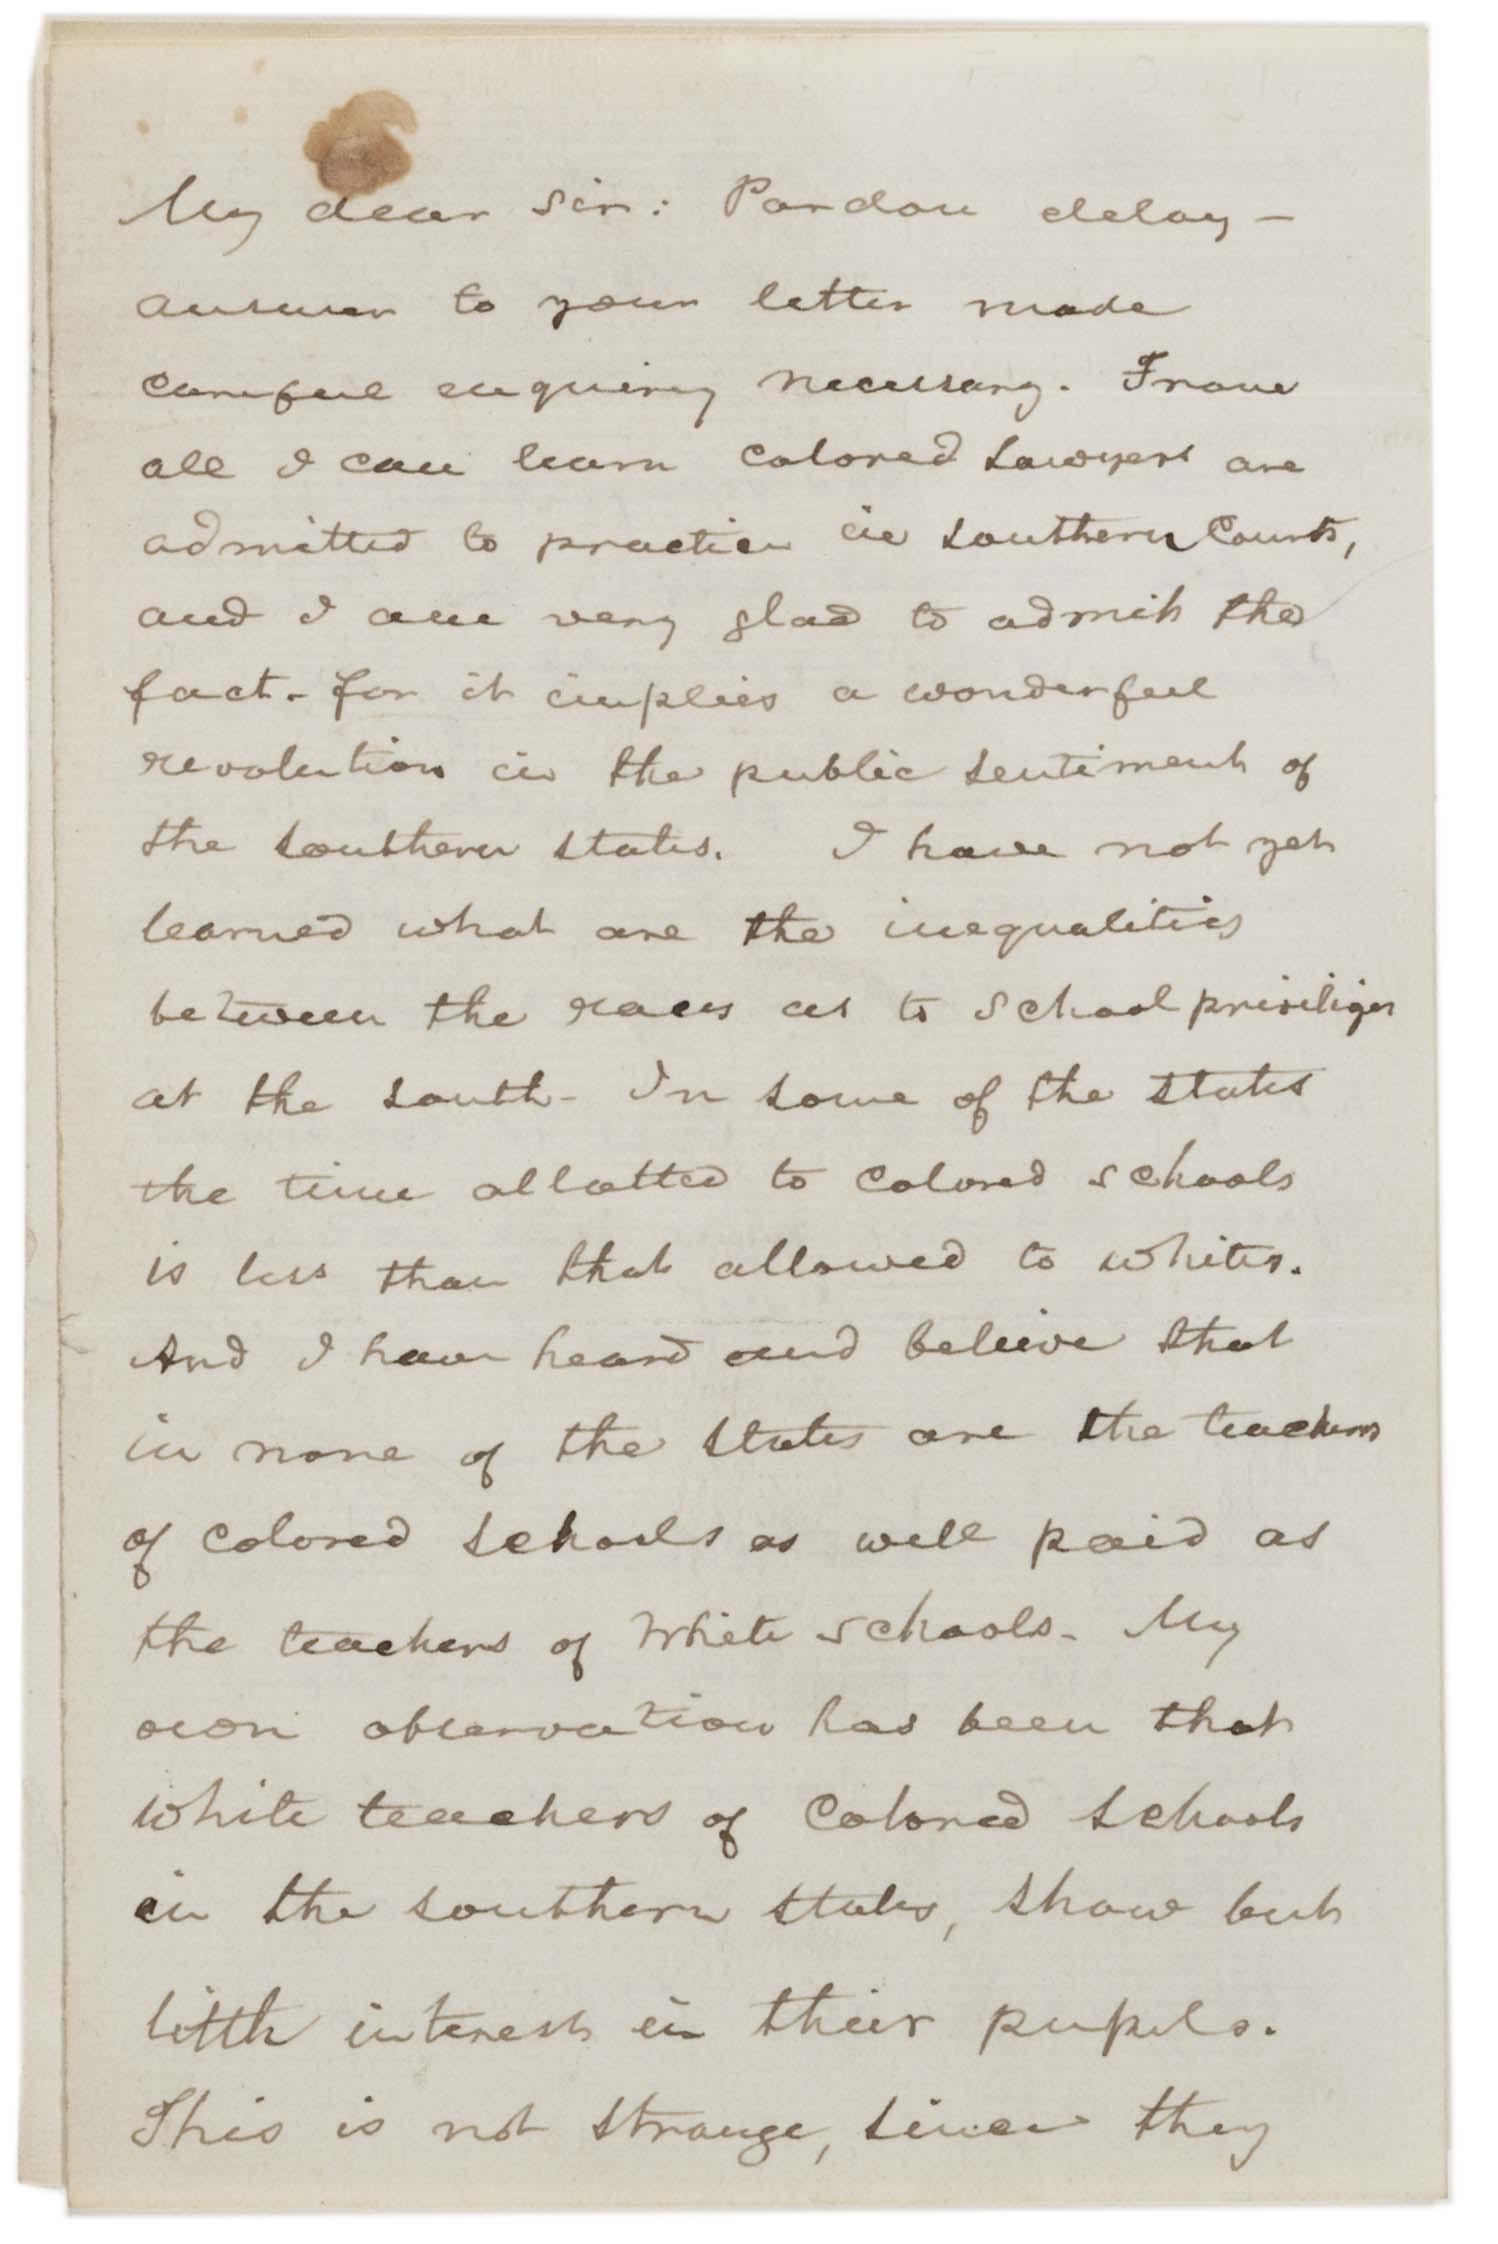 Frederick Dougl Ss Jim Crow 1887 Gilder Lehrm N Stitute Of